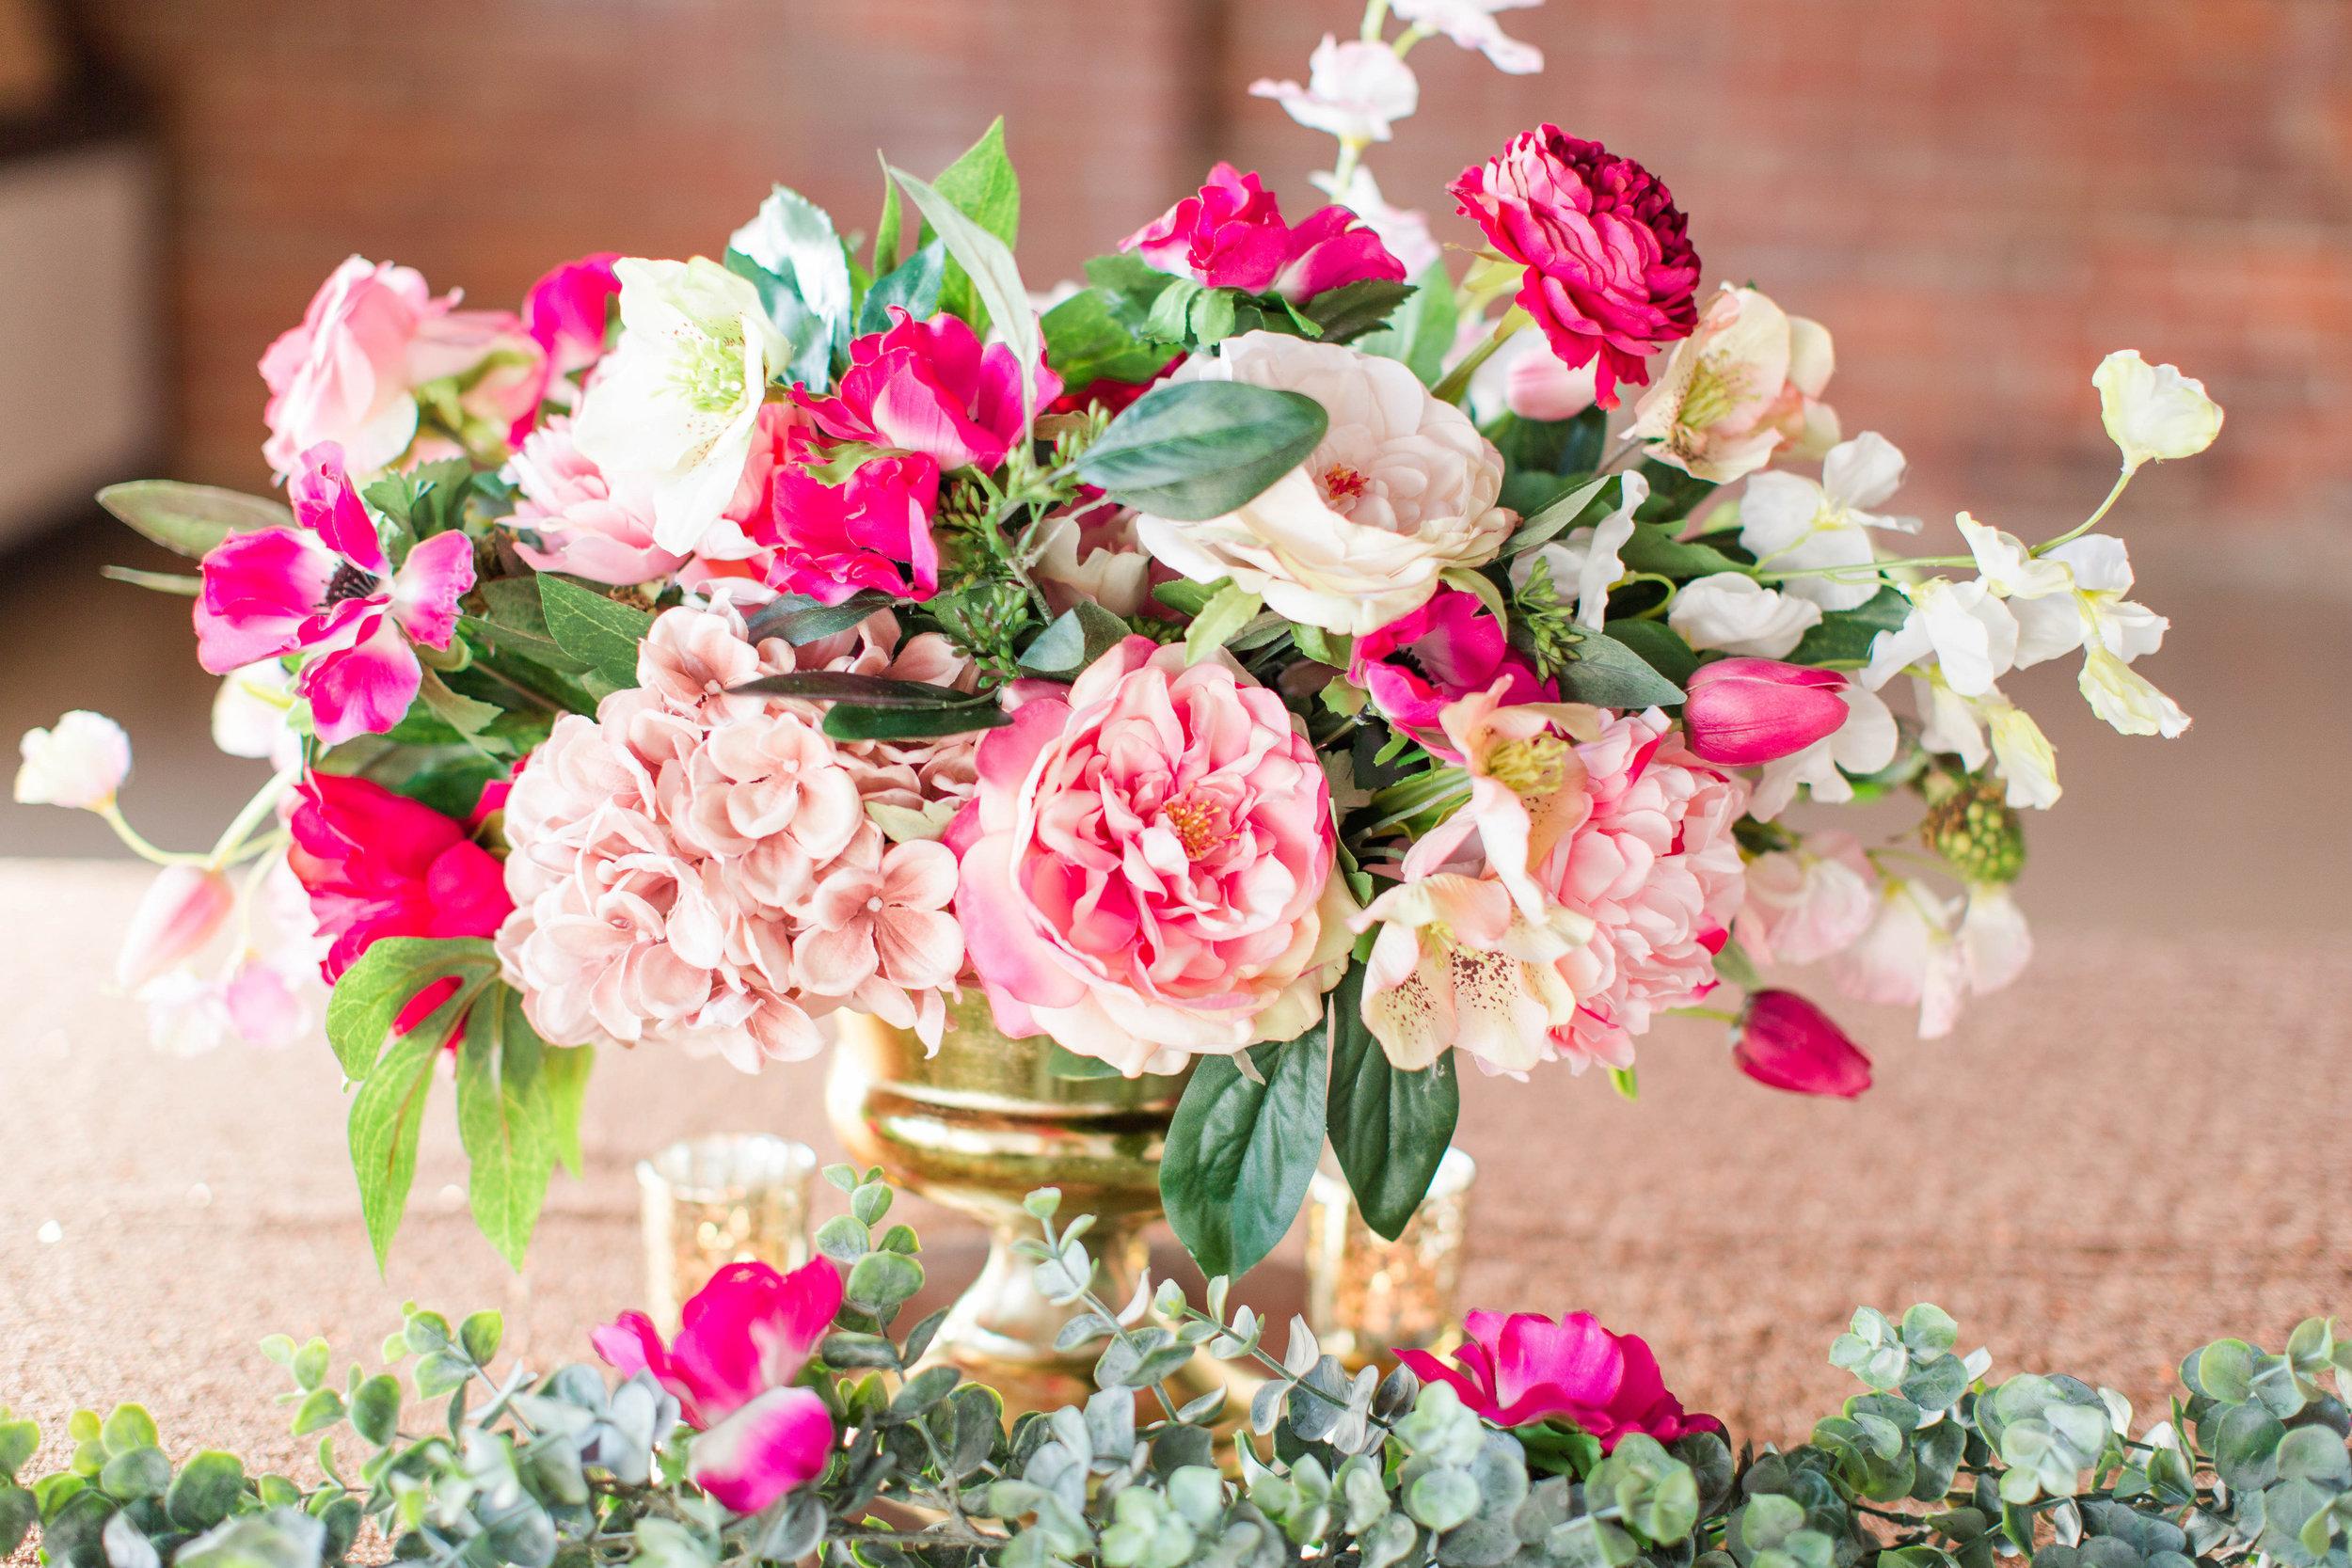 afloral-fake-flower-wedding-ivory-and-beau-bridal-boutique-maggie-sottero-saffron-the-hall-on-vine-wedding-statesboro-wedding-savannah-wedding-kristian-designs-rachel-strickland-photography-savannah-bridal-southern-bride-savannah-bride-22.jpg